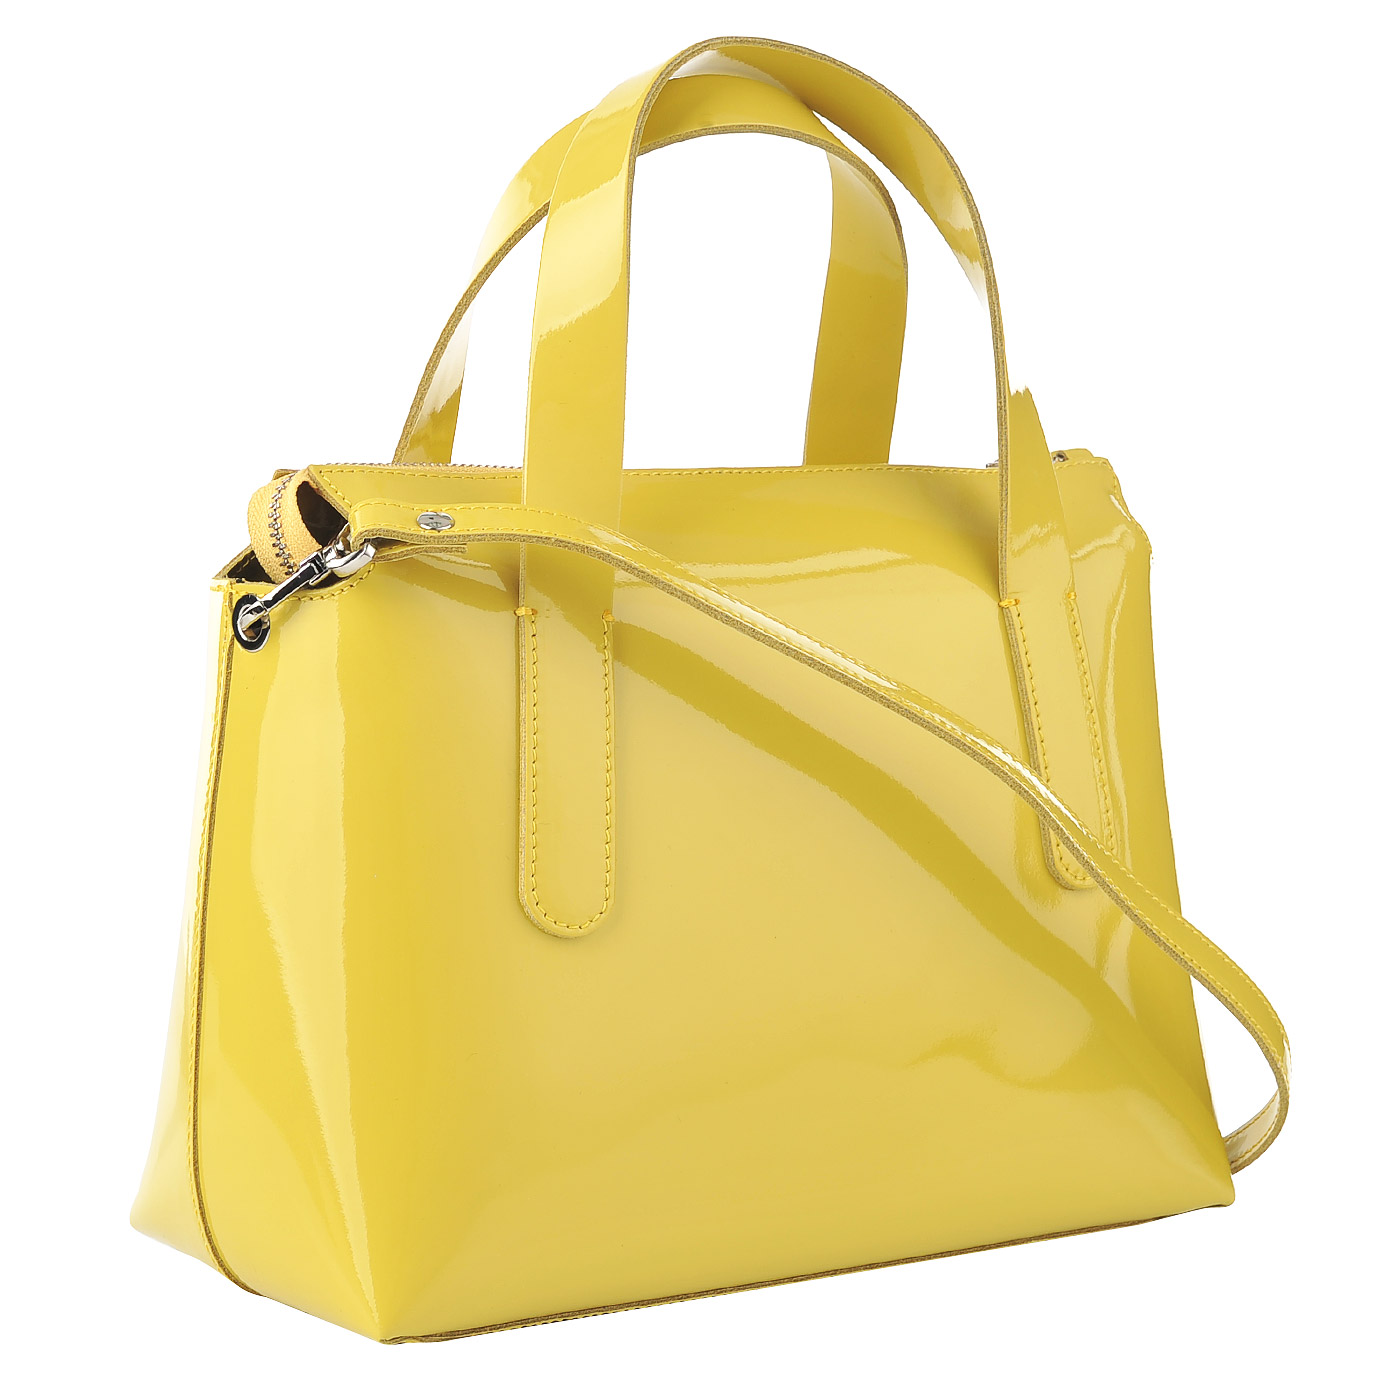 b26ca8a3ac8c Женская кожаная сумка Ripani Positano 7424QQ.00011 - 2000557670525 ...